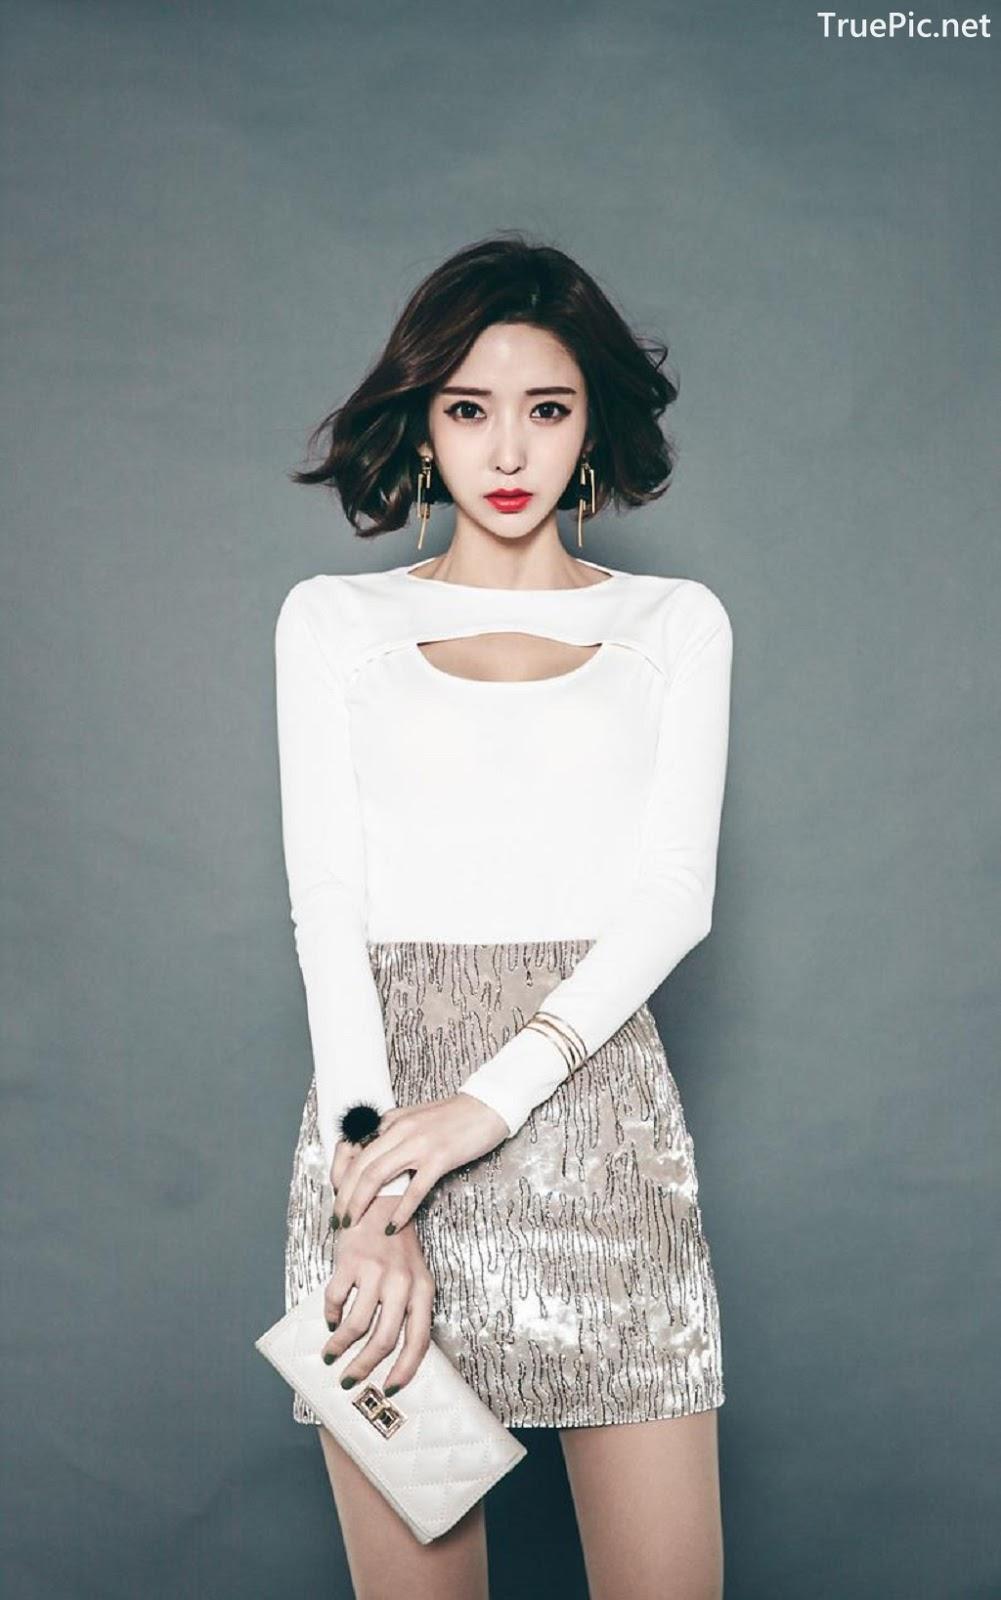 Image Ye Jin - Korean Fashion Model - Studio Photoshoot Collection - TruePic.net - Picture-8